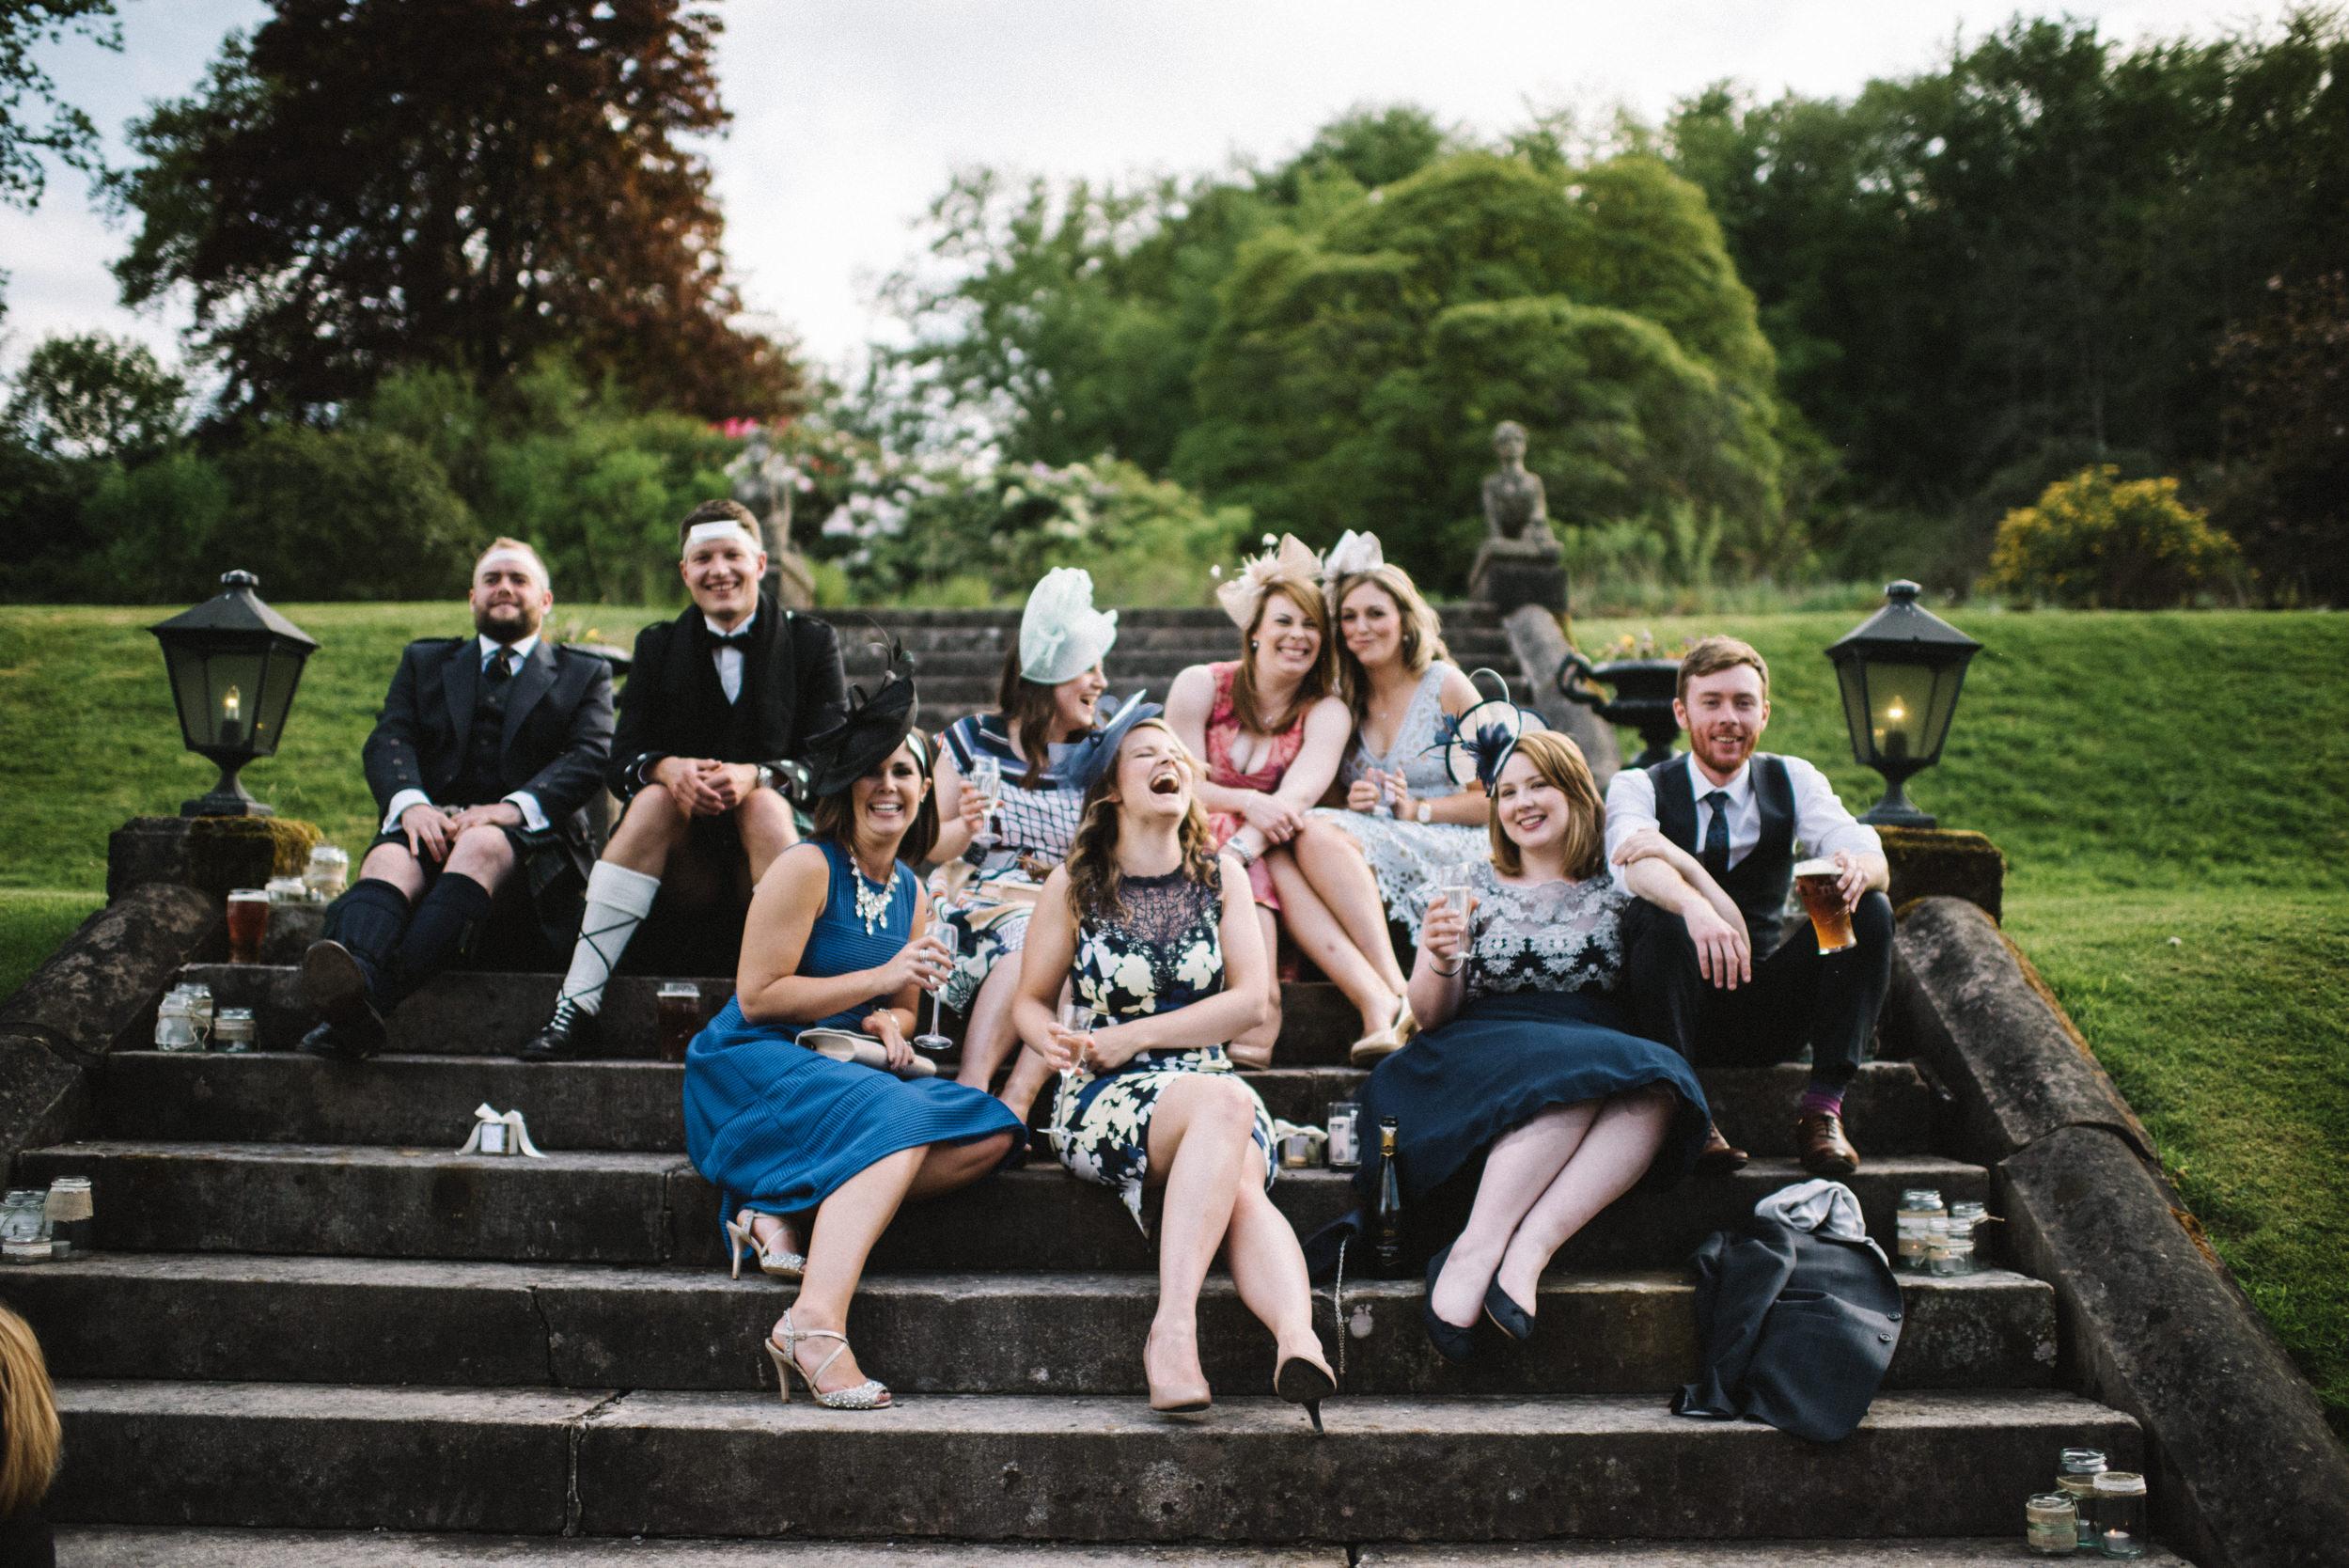 0028-alternative-wedding-portrait-family-kids-photographer-glasgow-scotland.JPG